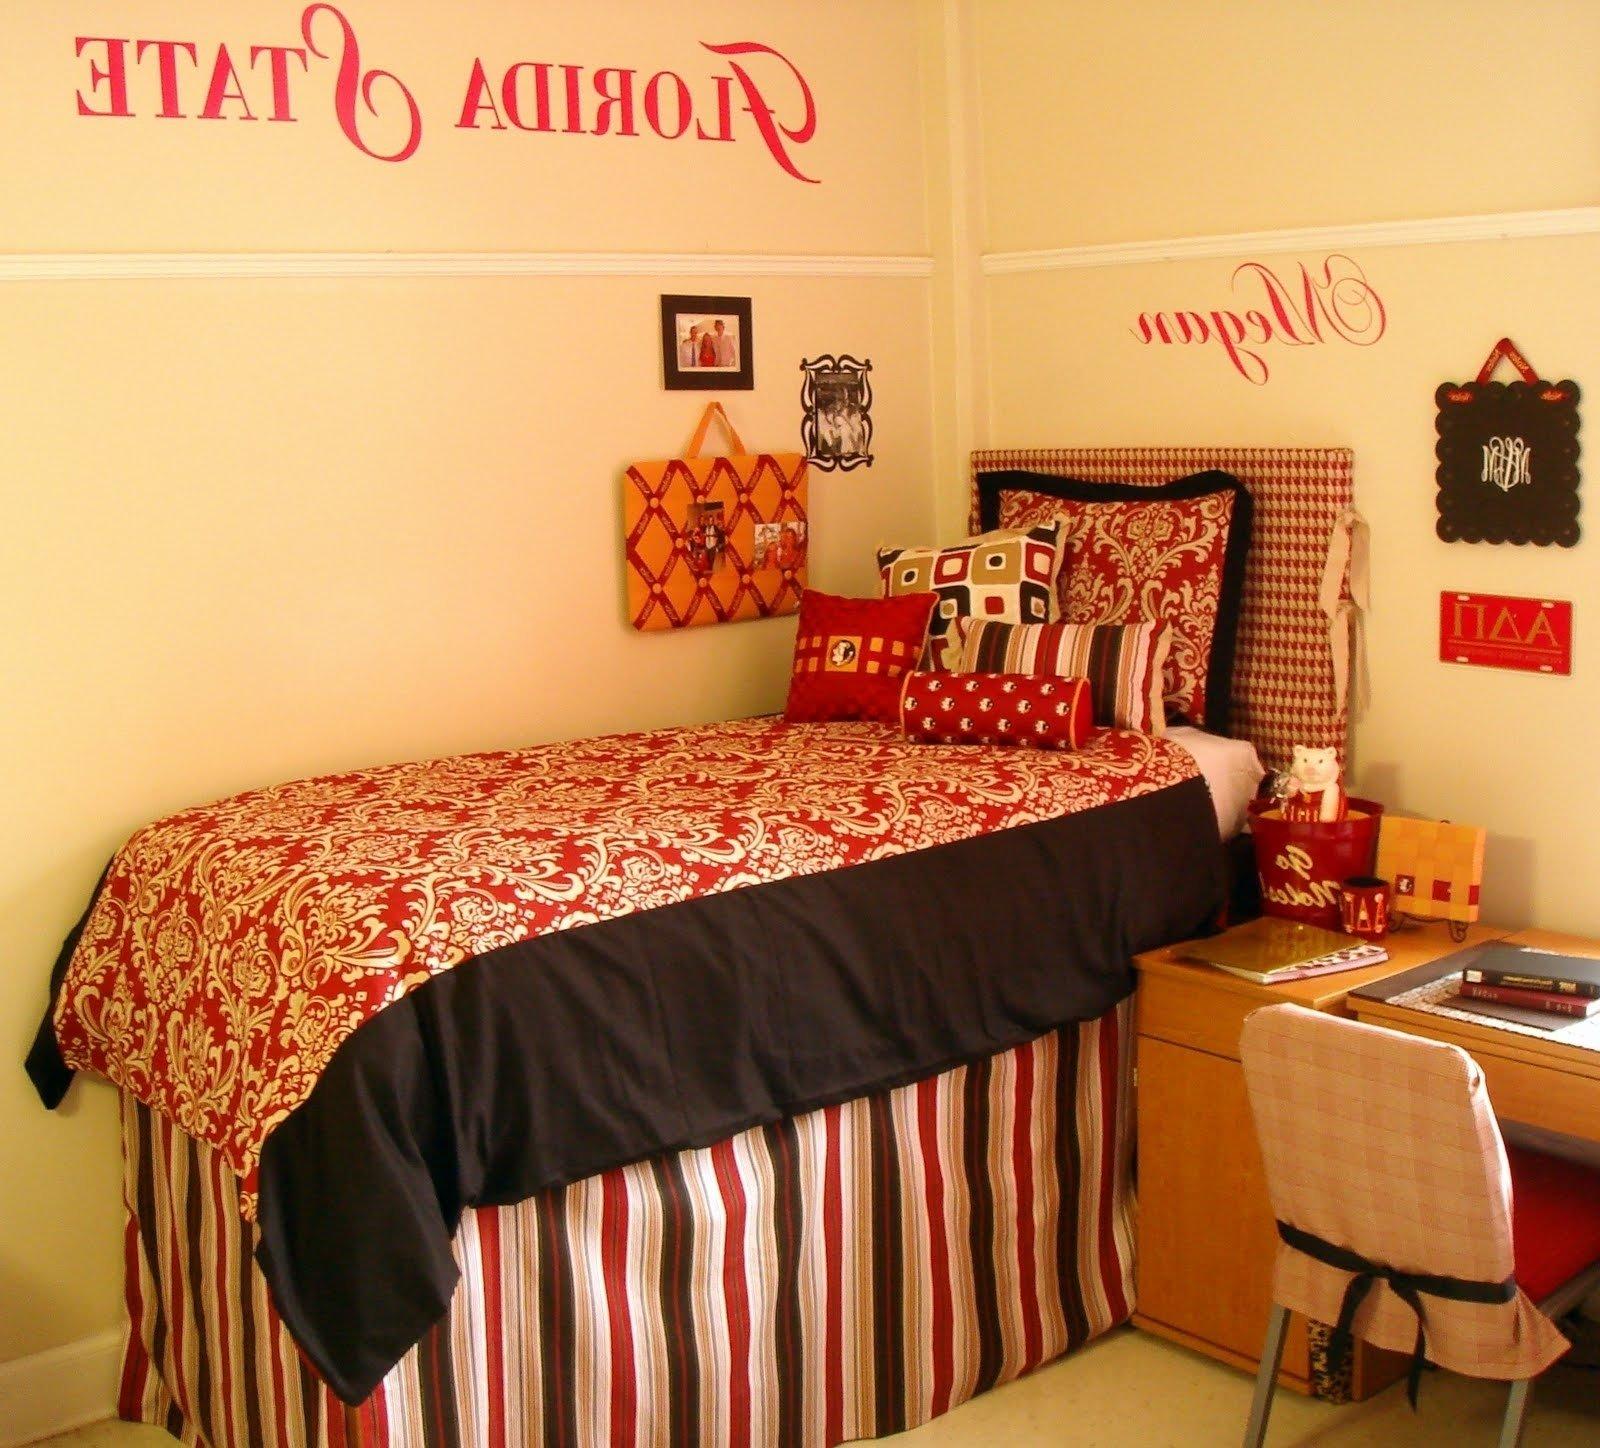 10 Cute College Dorm Ideas For Girls teens room girls dorm ideas for teen home model cute decorating 2020